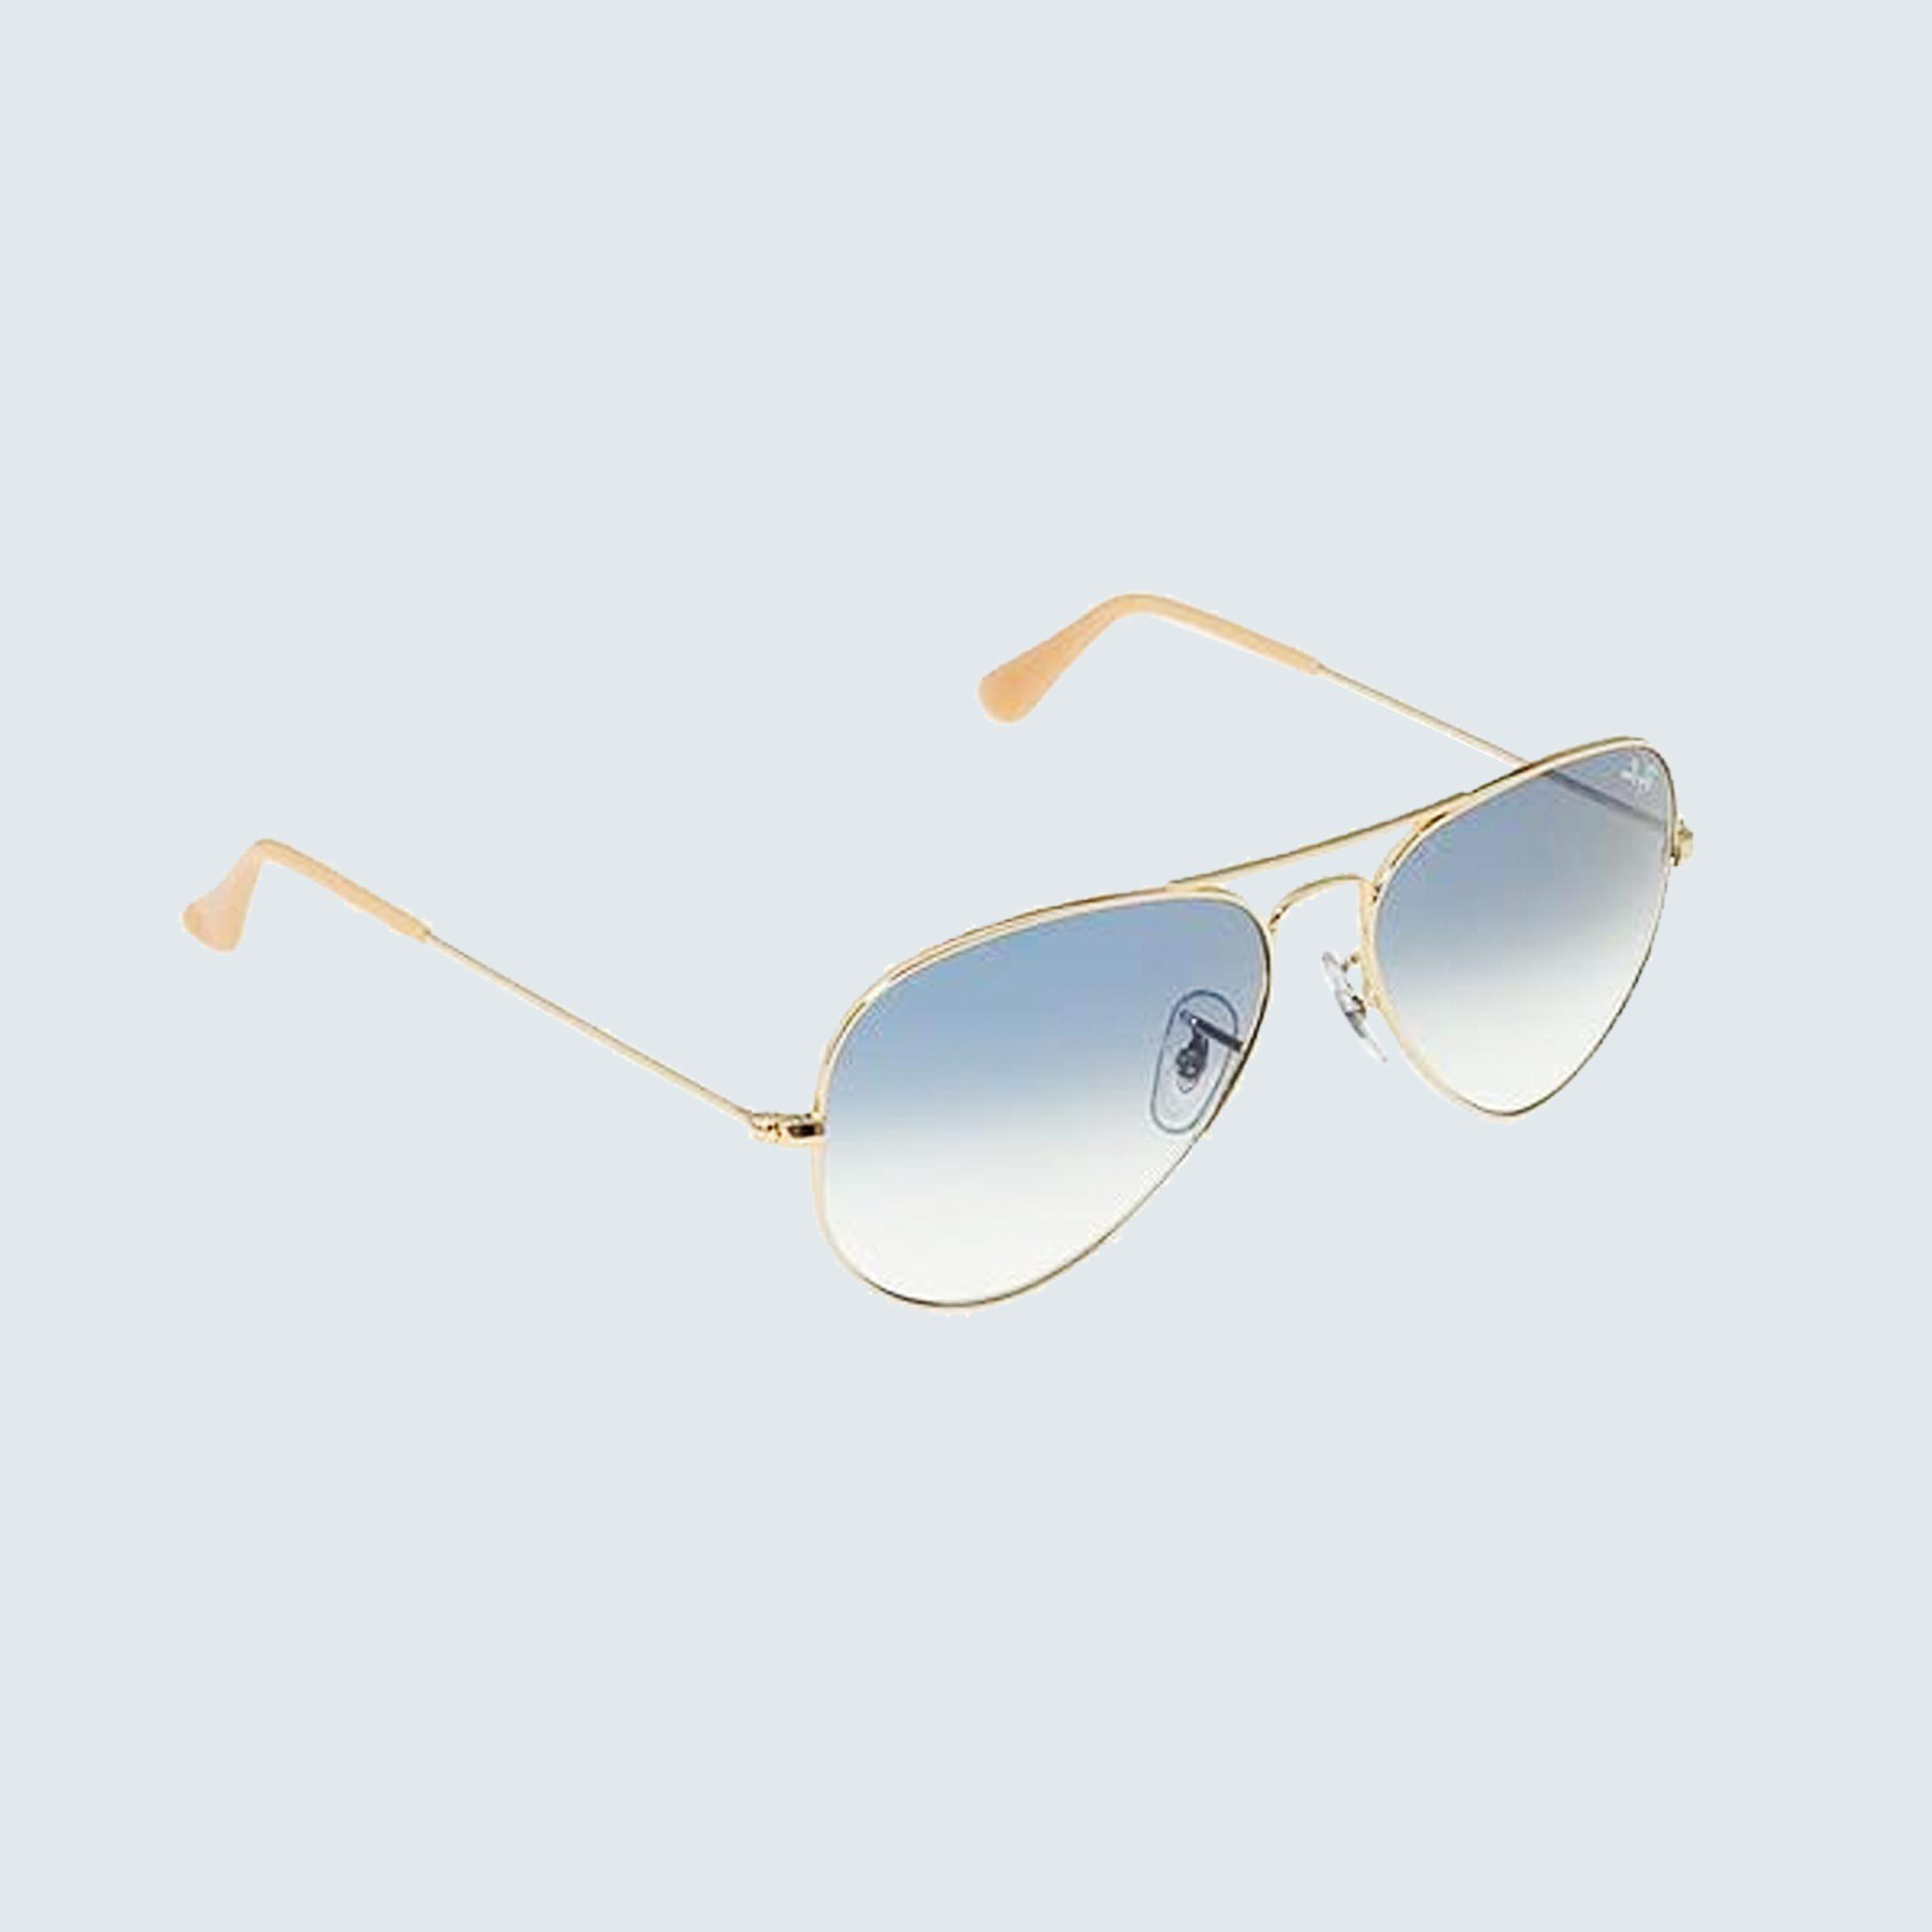 Ray-Ban Original Aviator Sunglasses 55mm